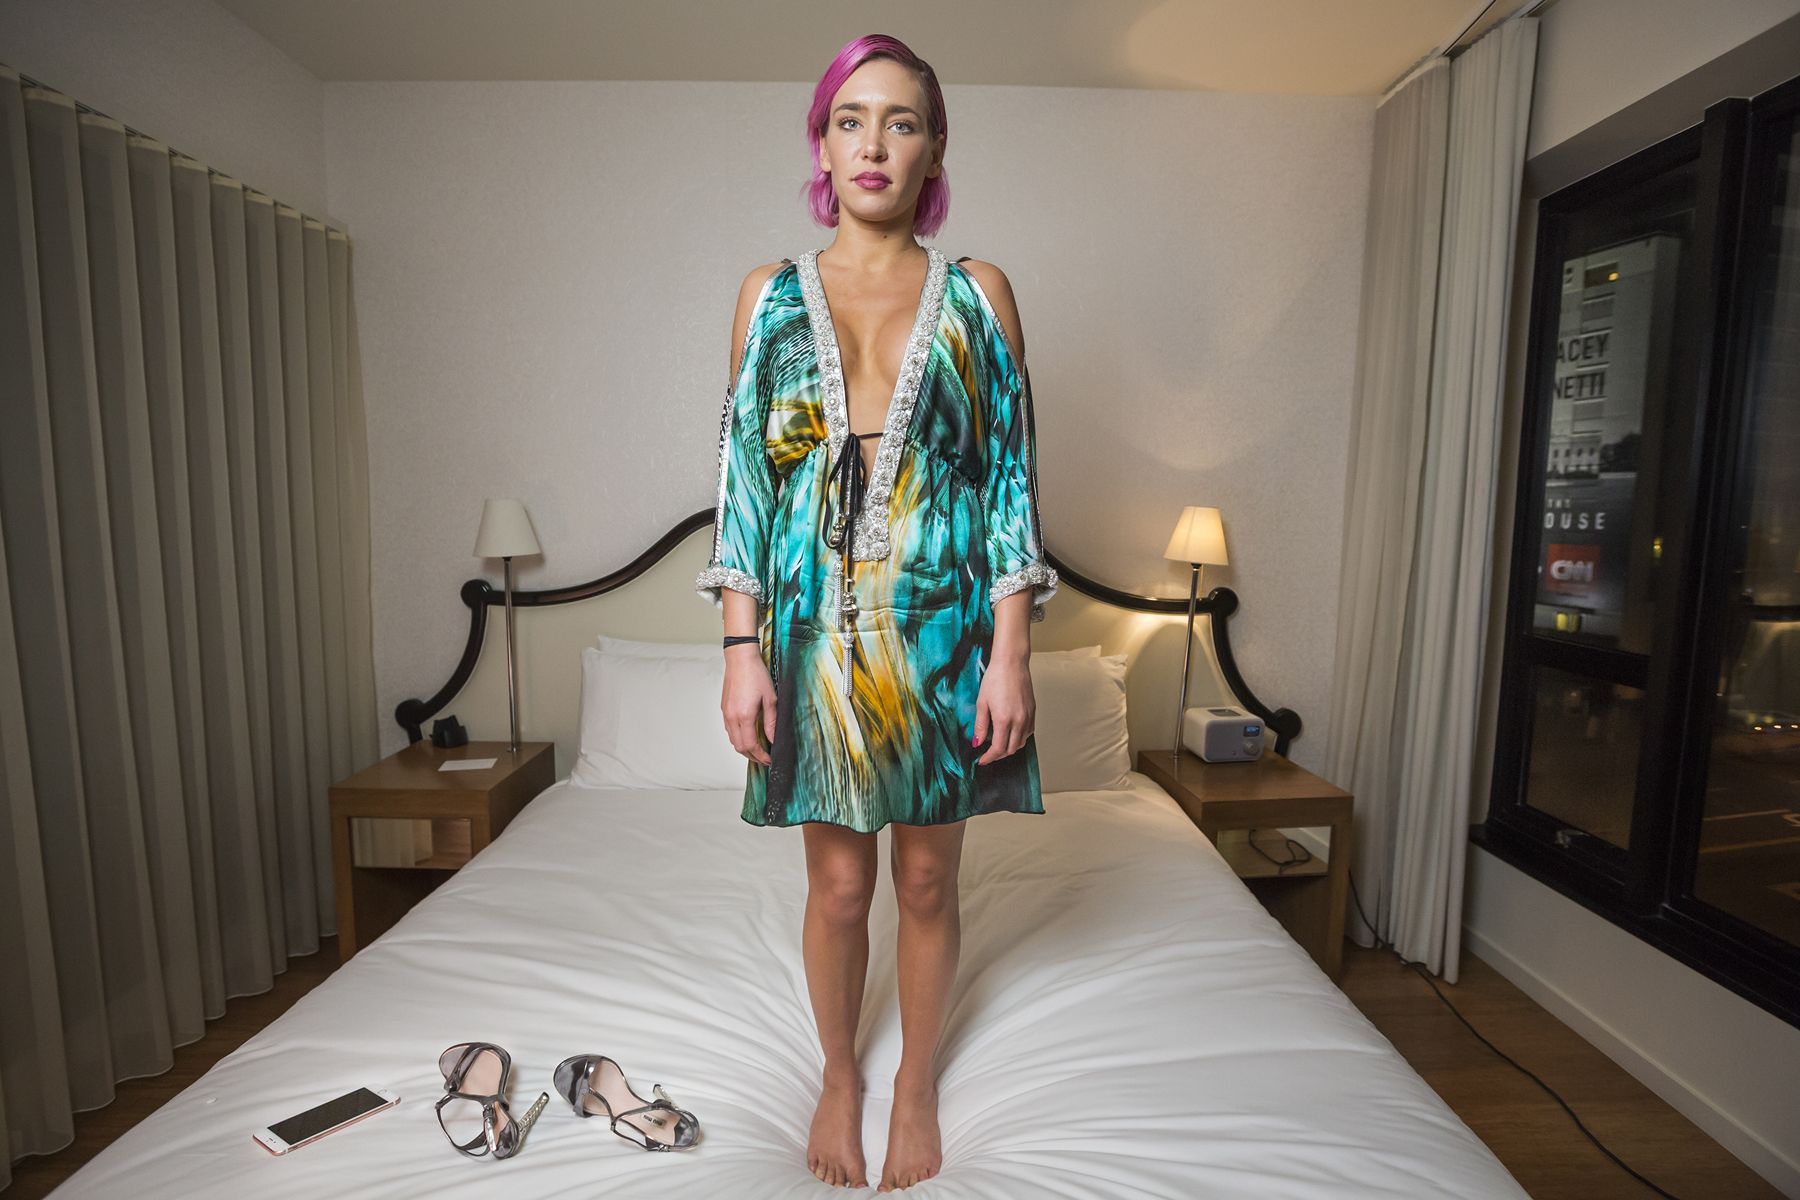 Daveney, 27, formerly Kacey Jordan, at the Mondrian Hotel, West Hollywood, 2016